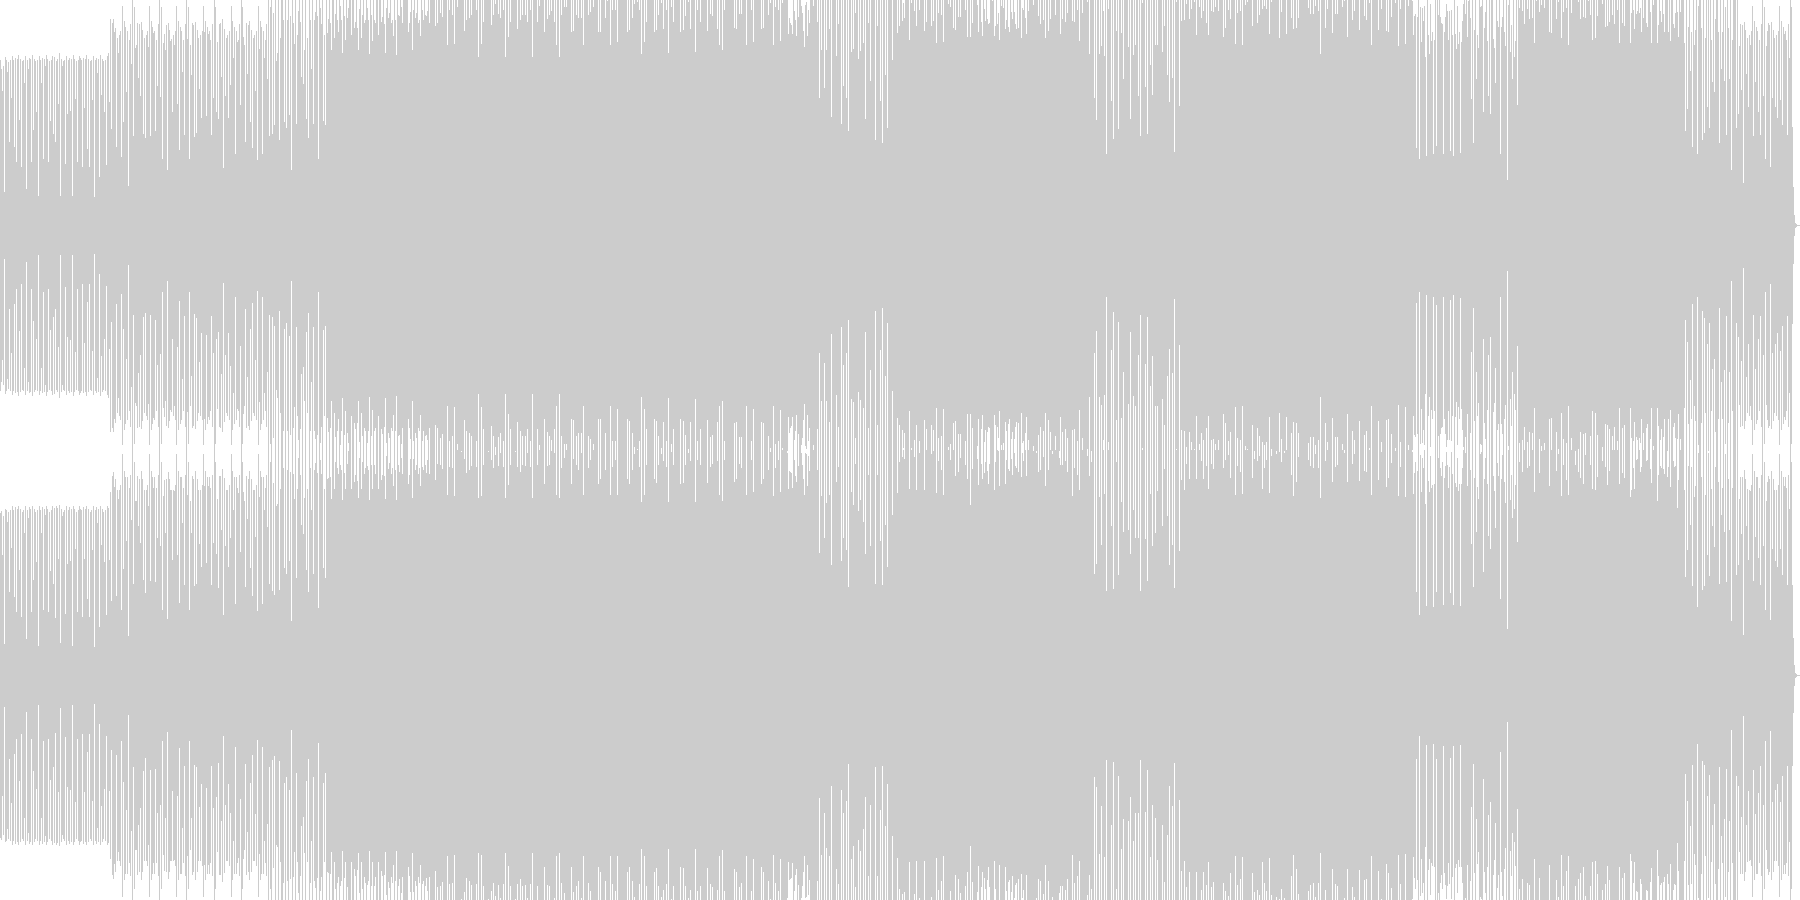 minimal house 6 の未再生の波形